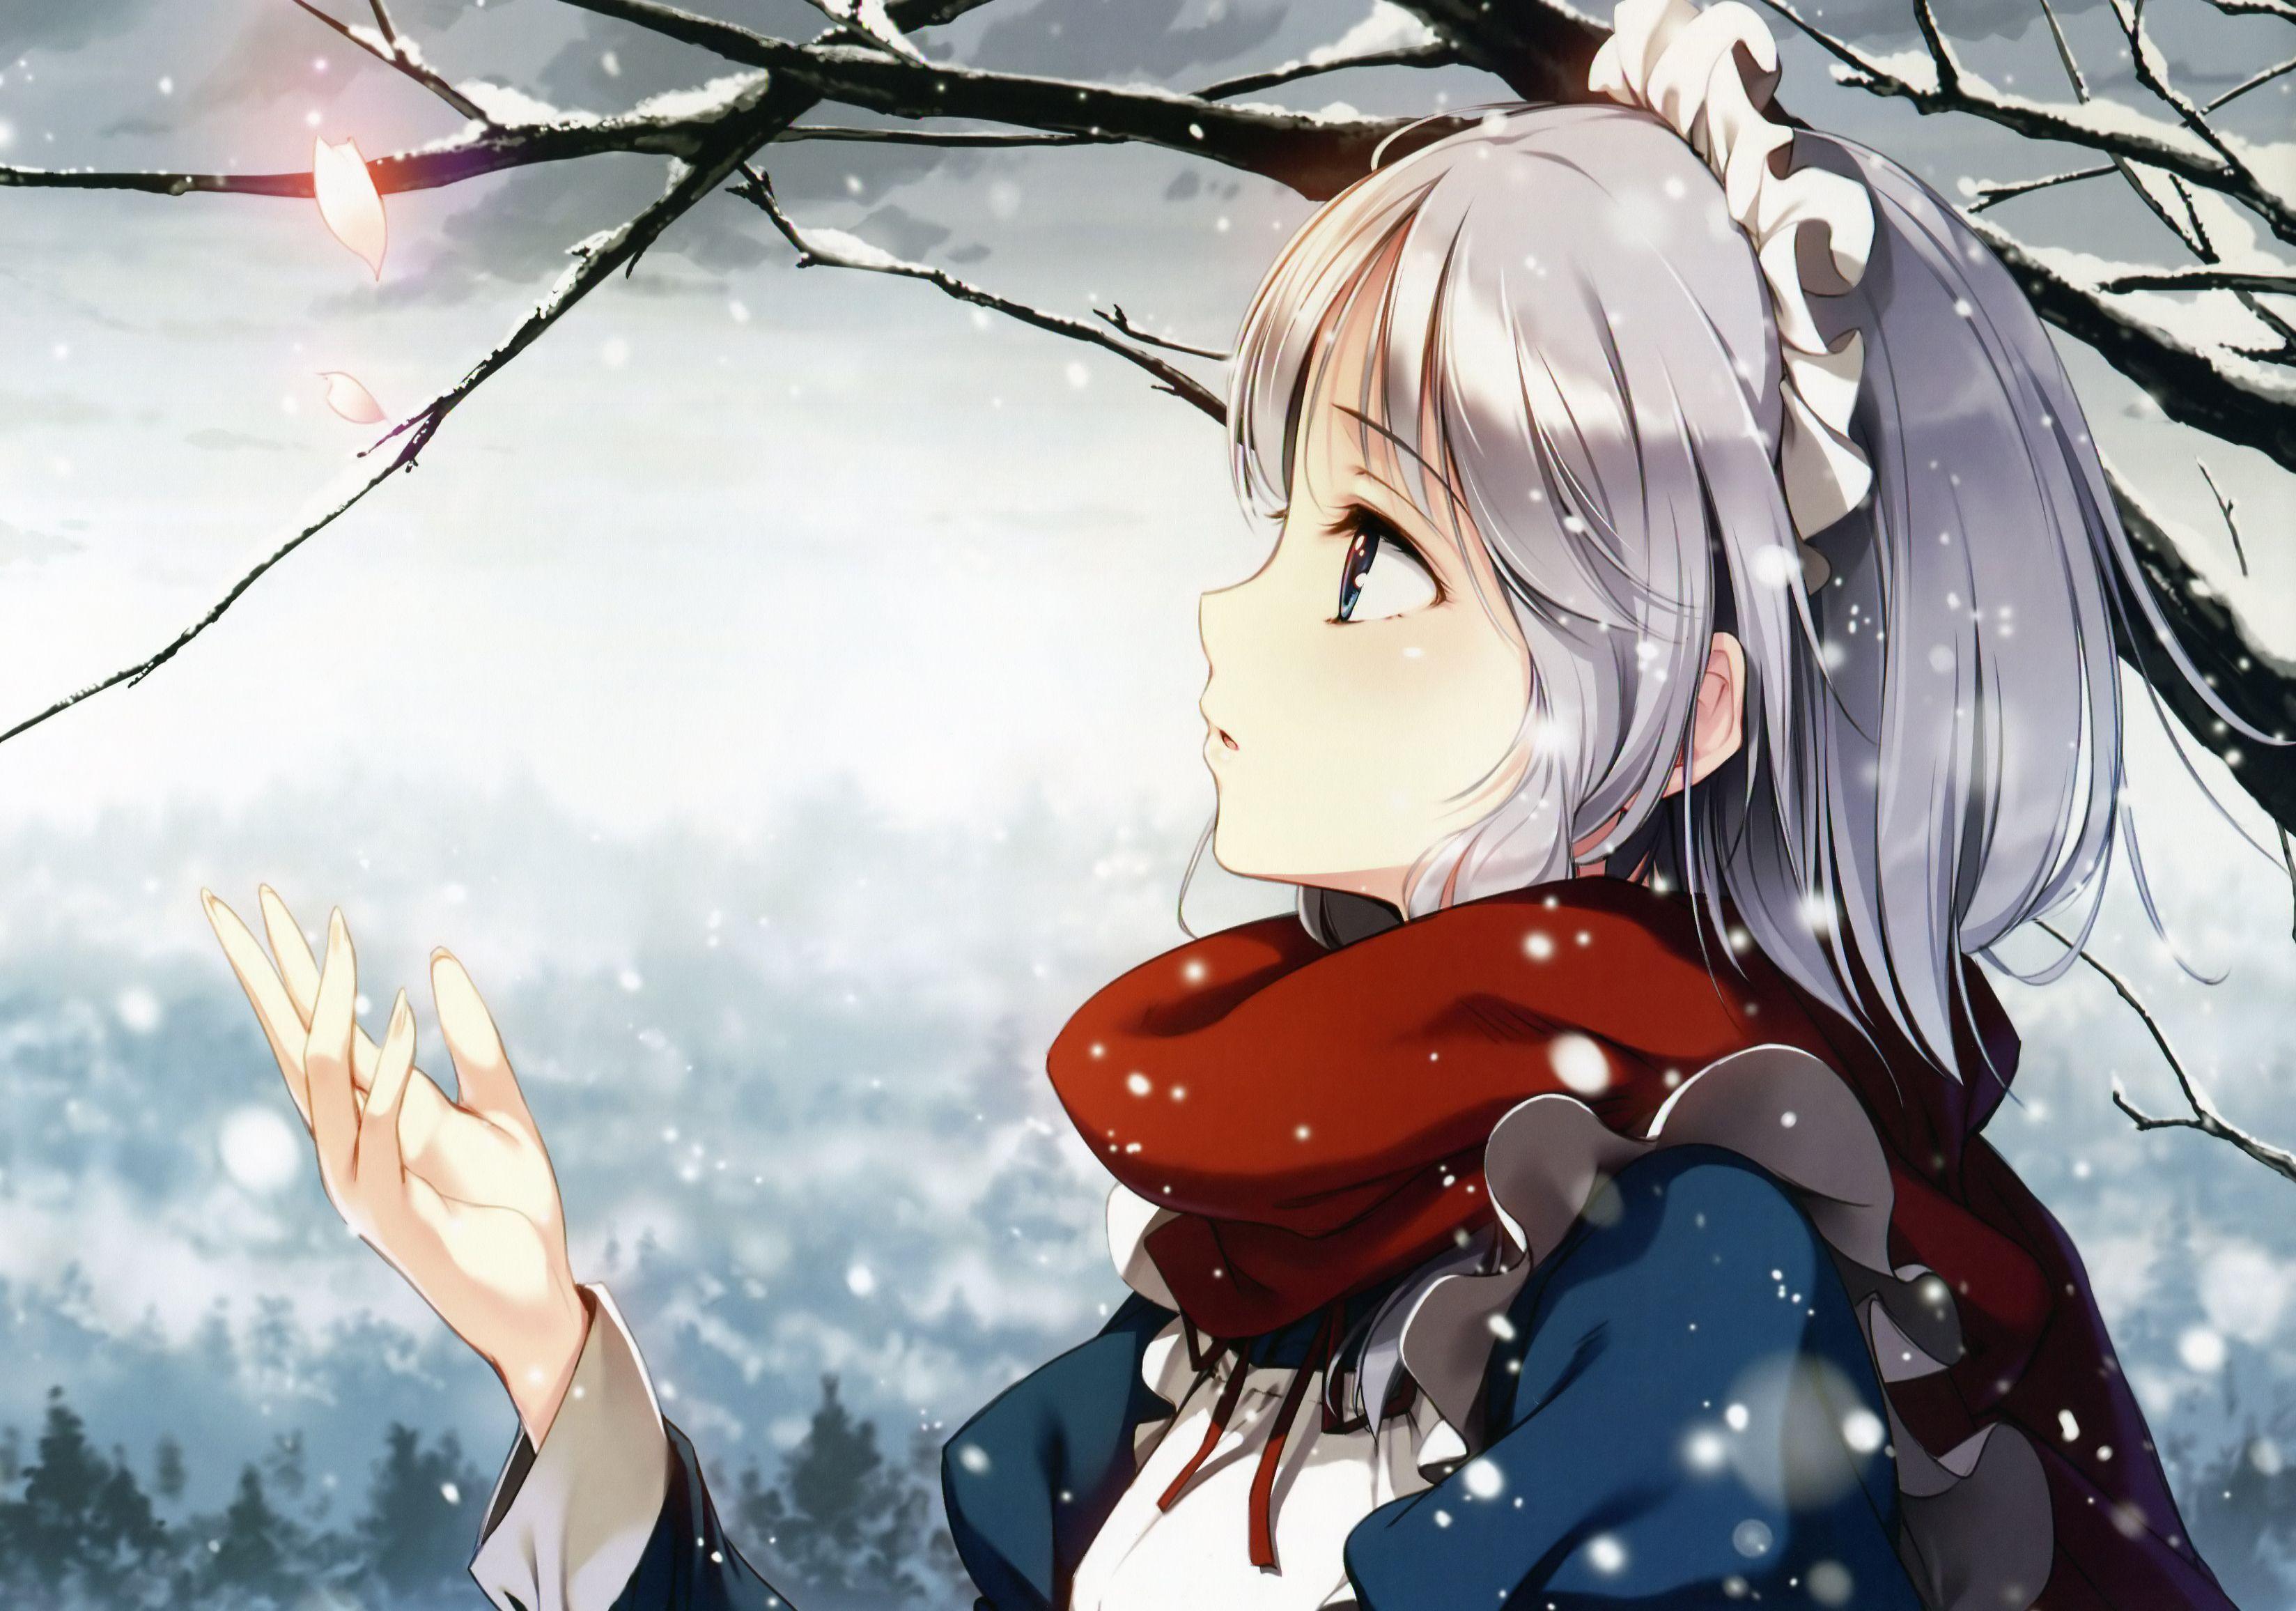 Anime Snow Winter Girl Anime Snow Anime Wallpaper Art